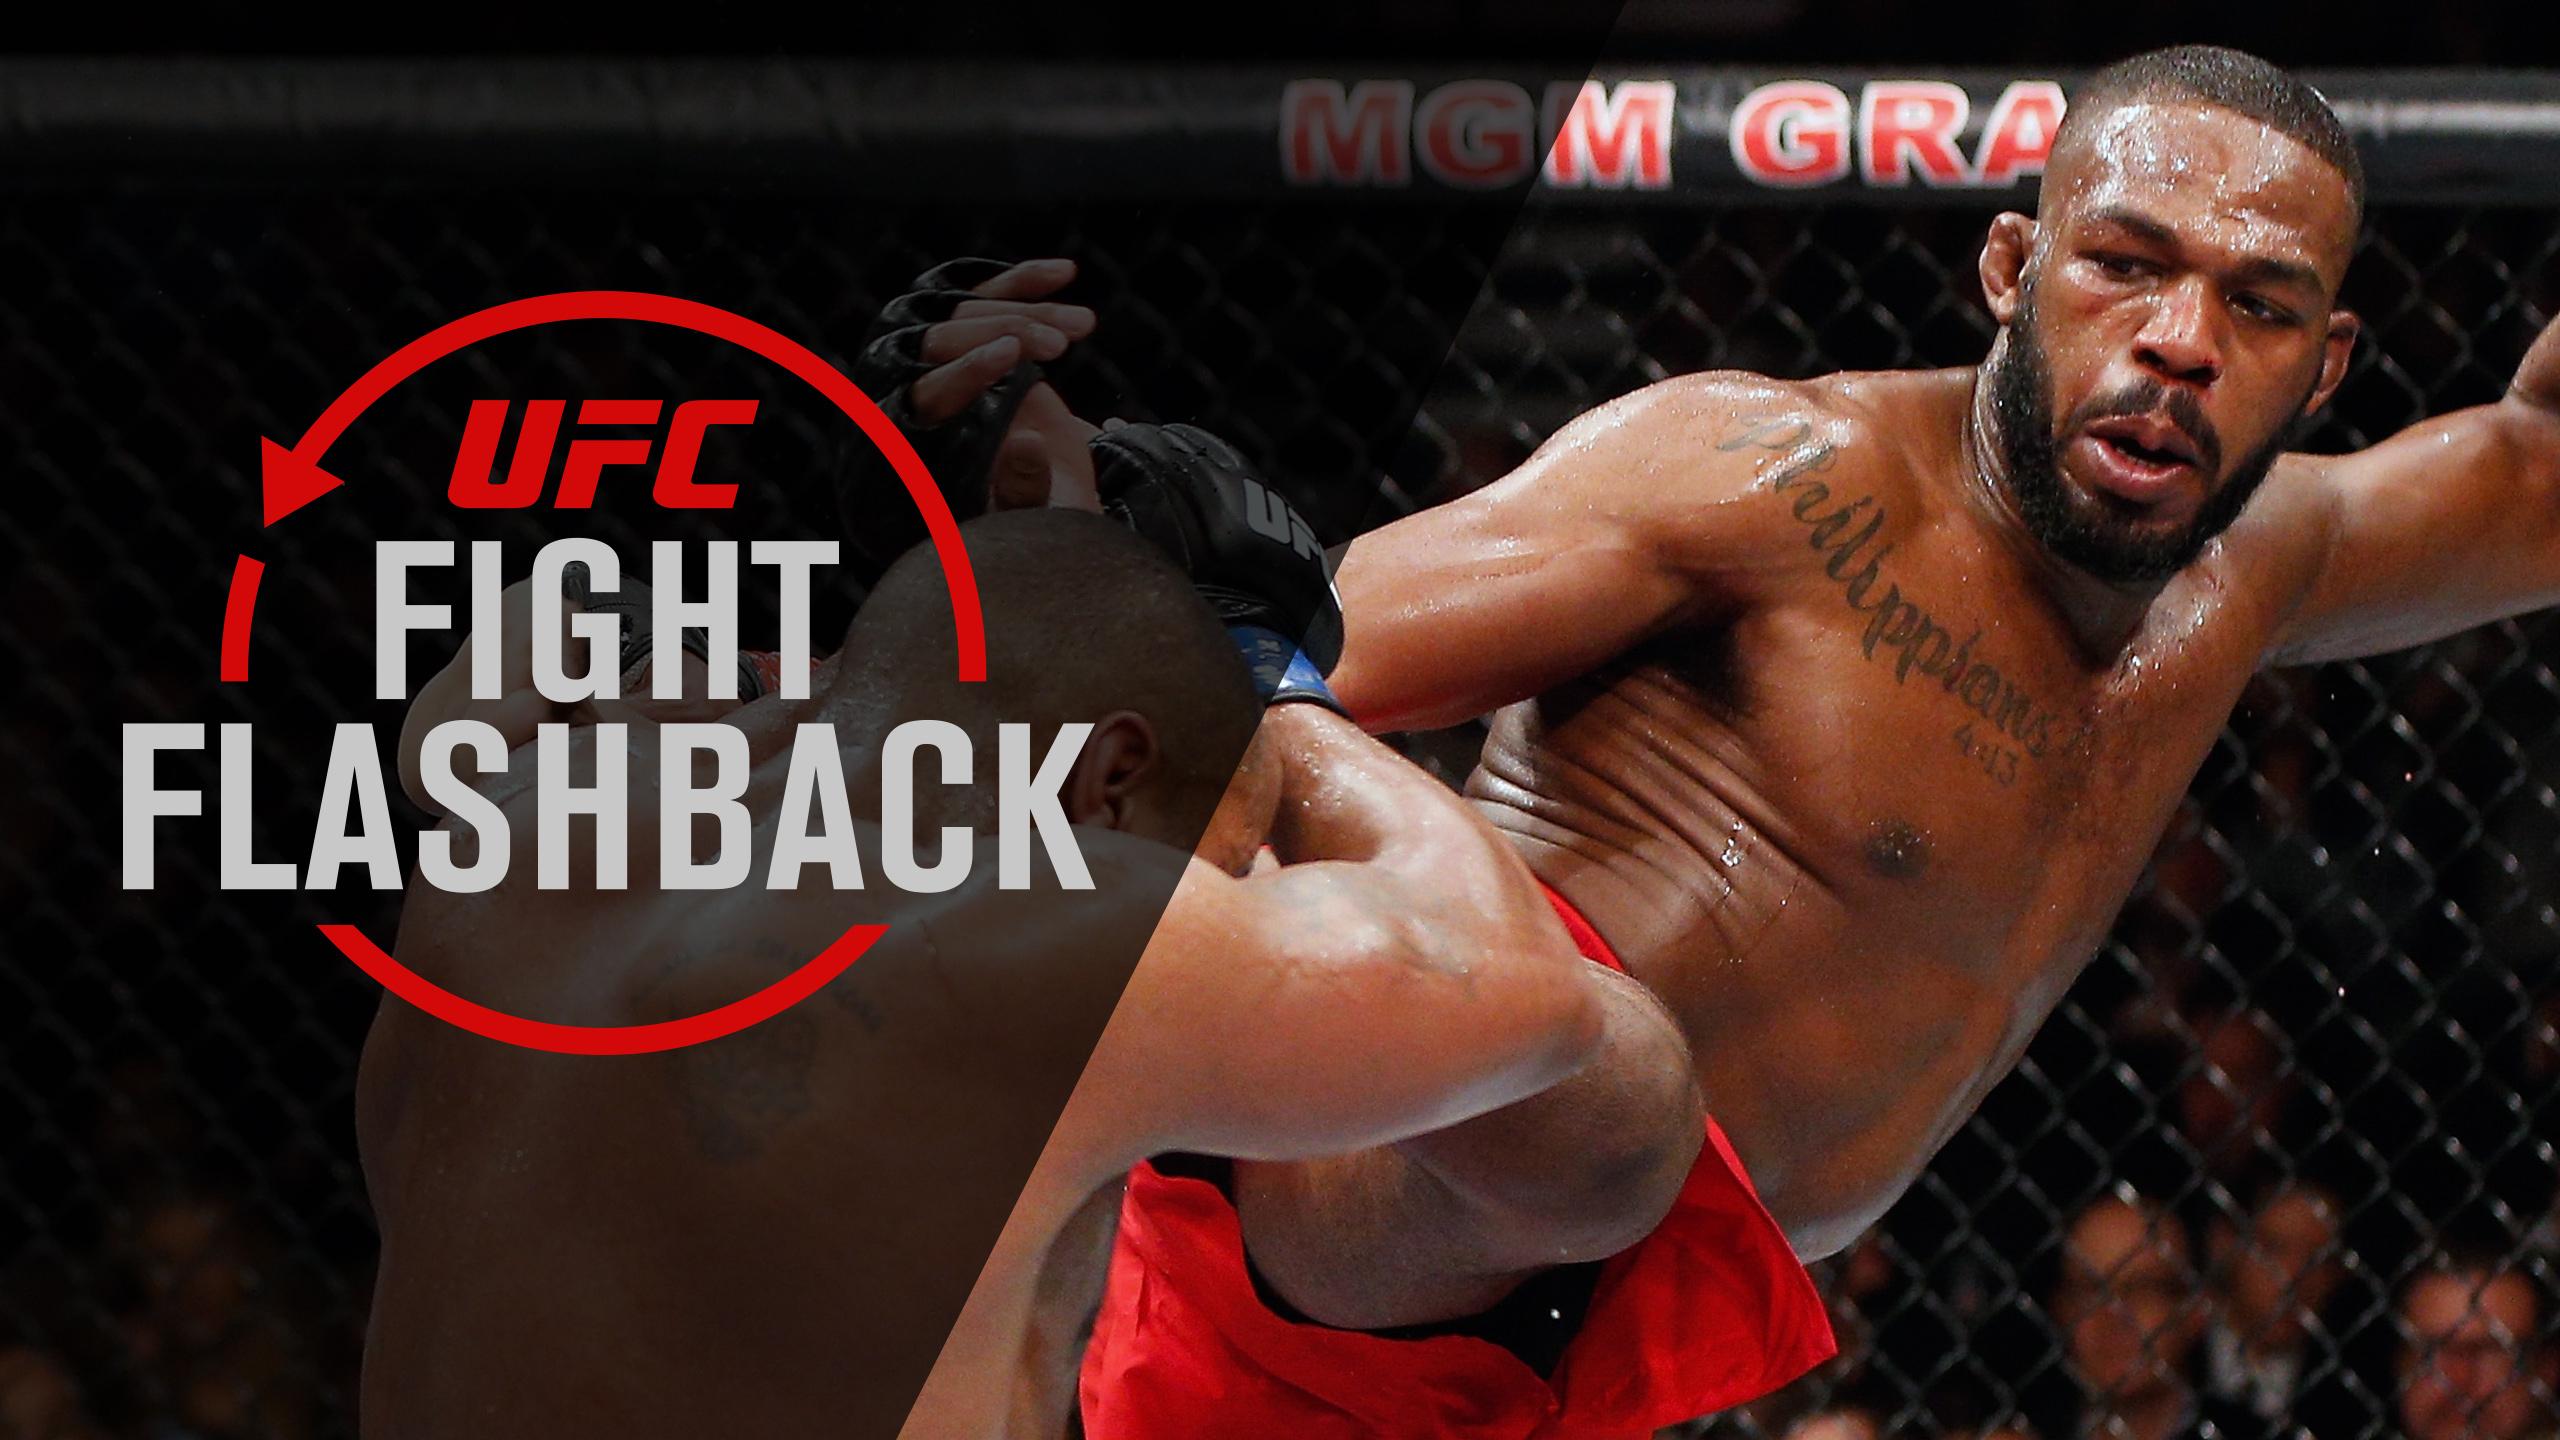 UFC Fight Flashback: Jones vs. Cormier